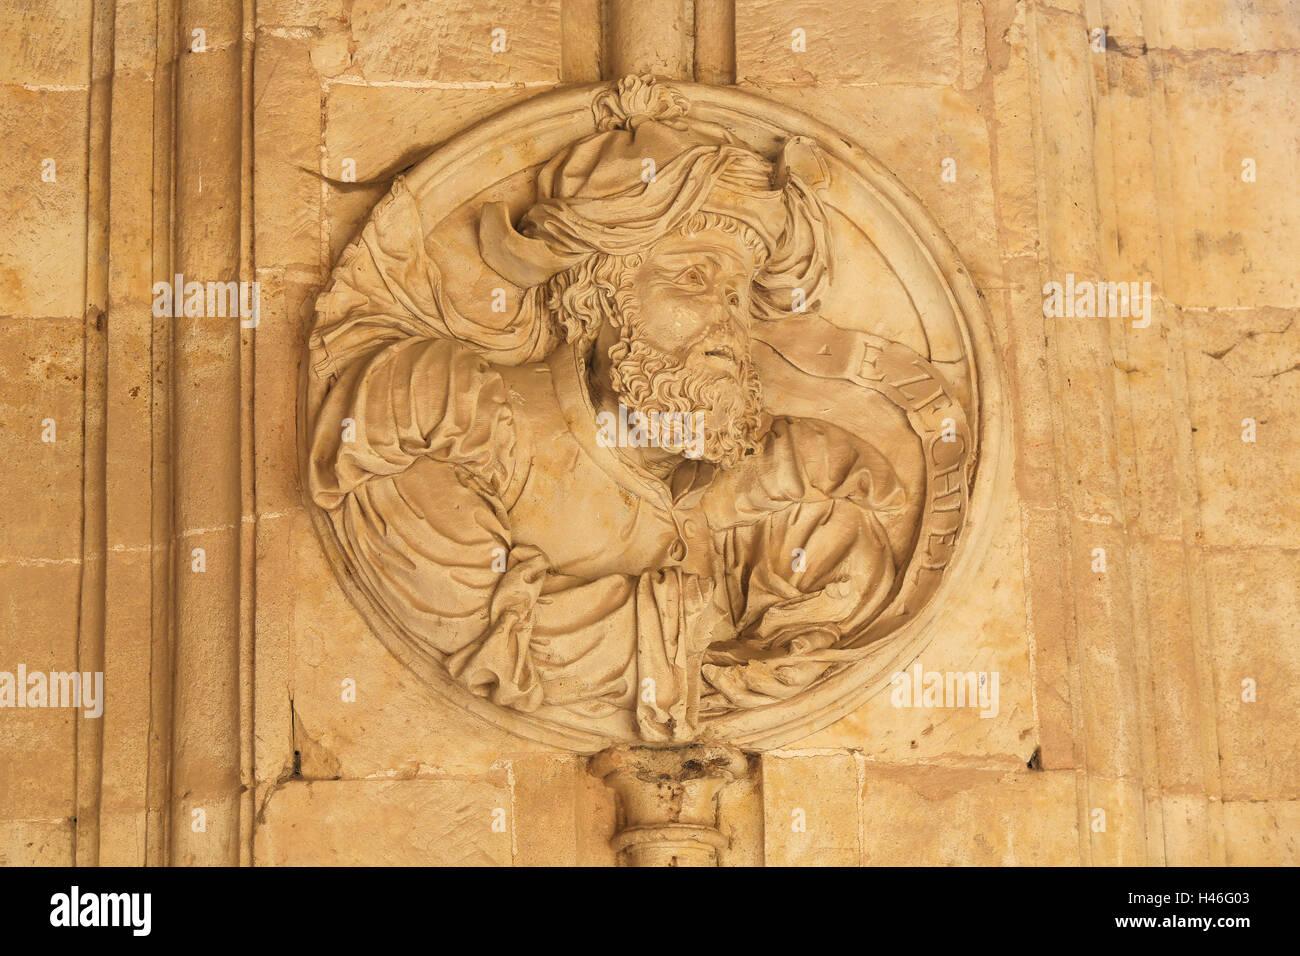 Bas relief of the Prophet Ezekiel in the Cloister of the Convento de San Esteban, a Dominican monastery in Salamanca, - Stock Image